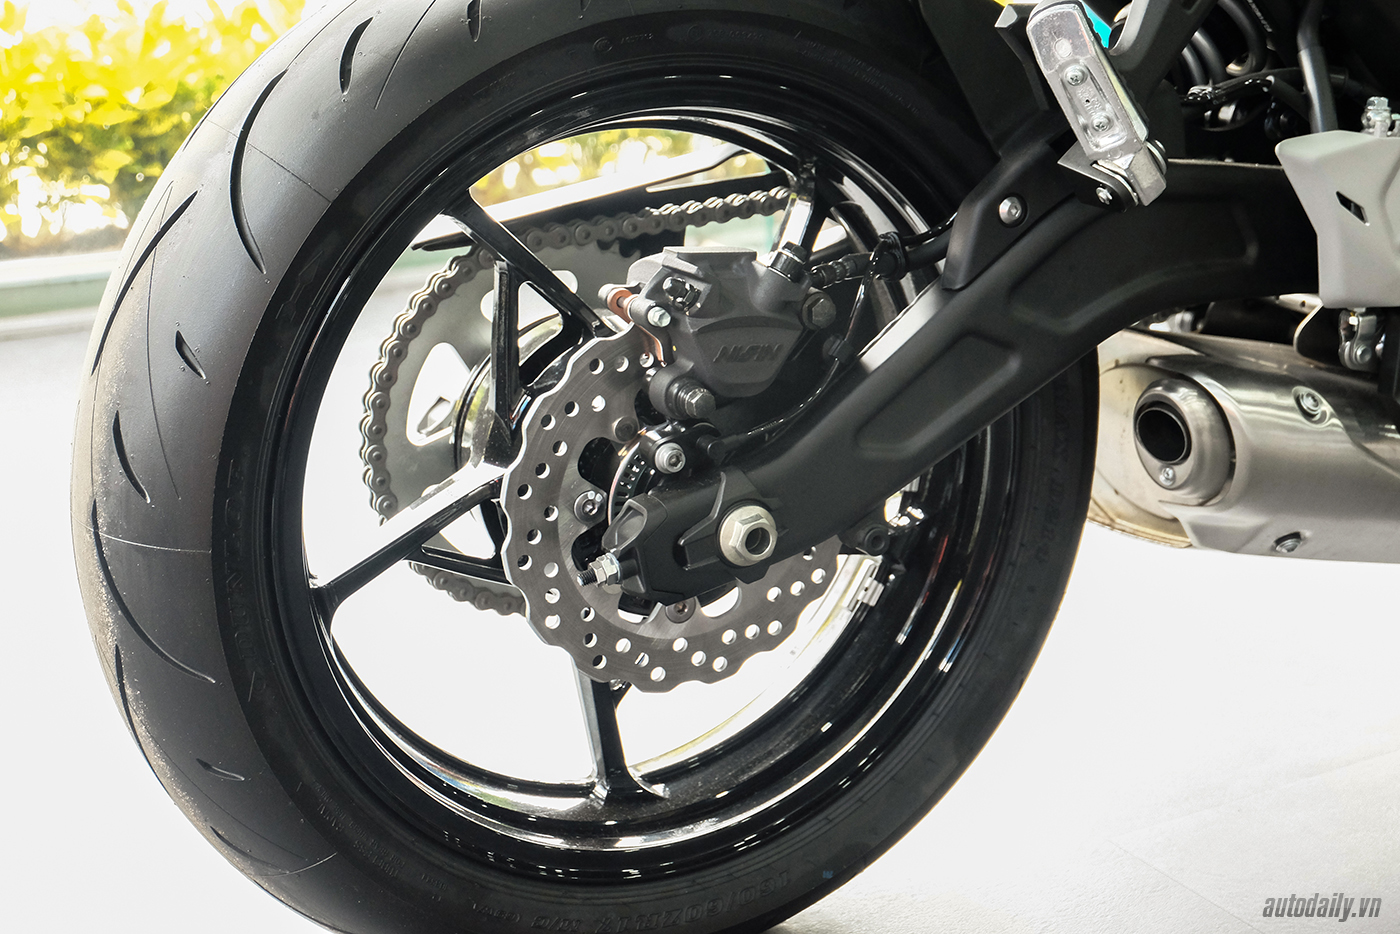 kawasaki-ninja-650-13.jpg